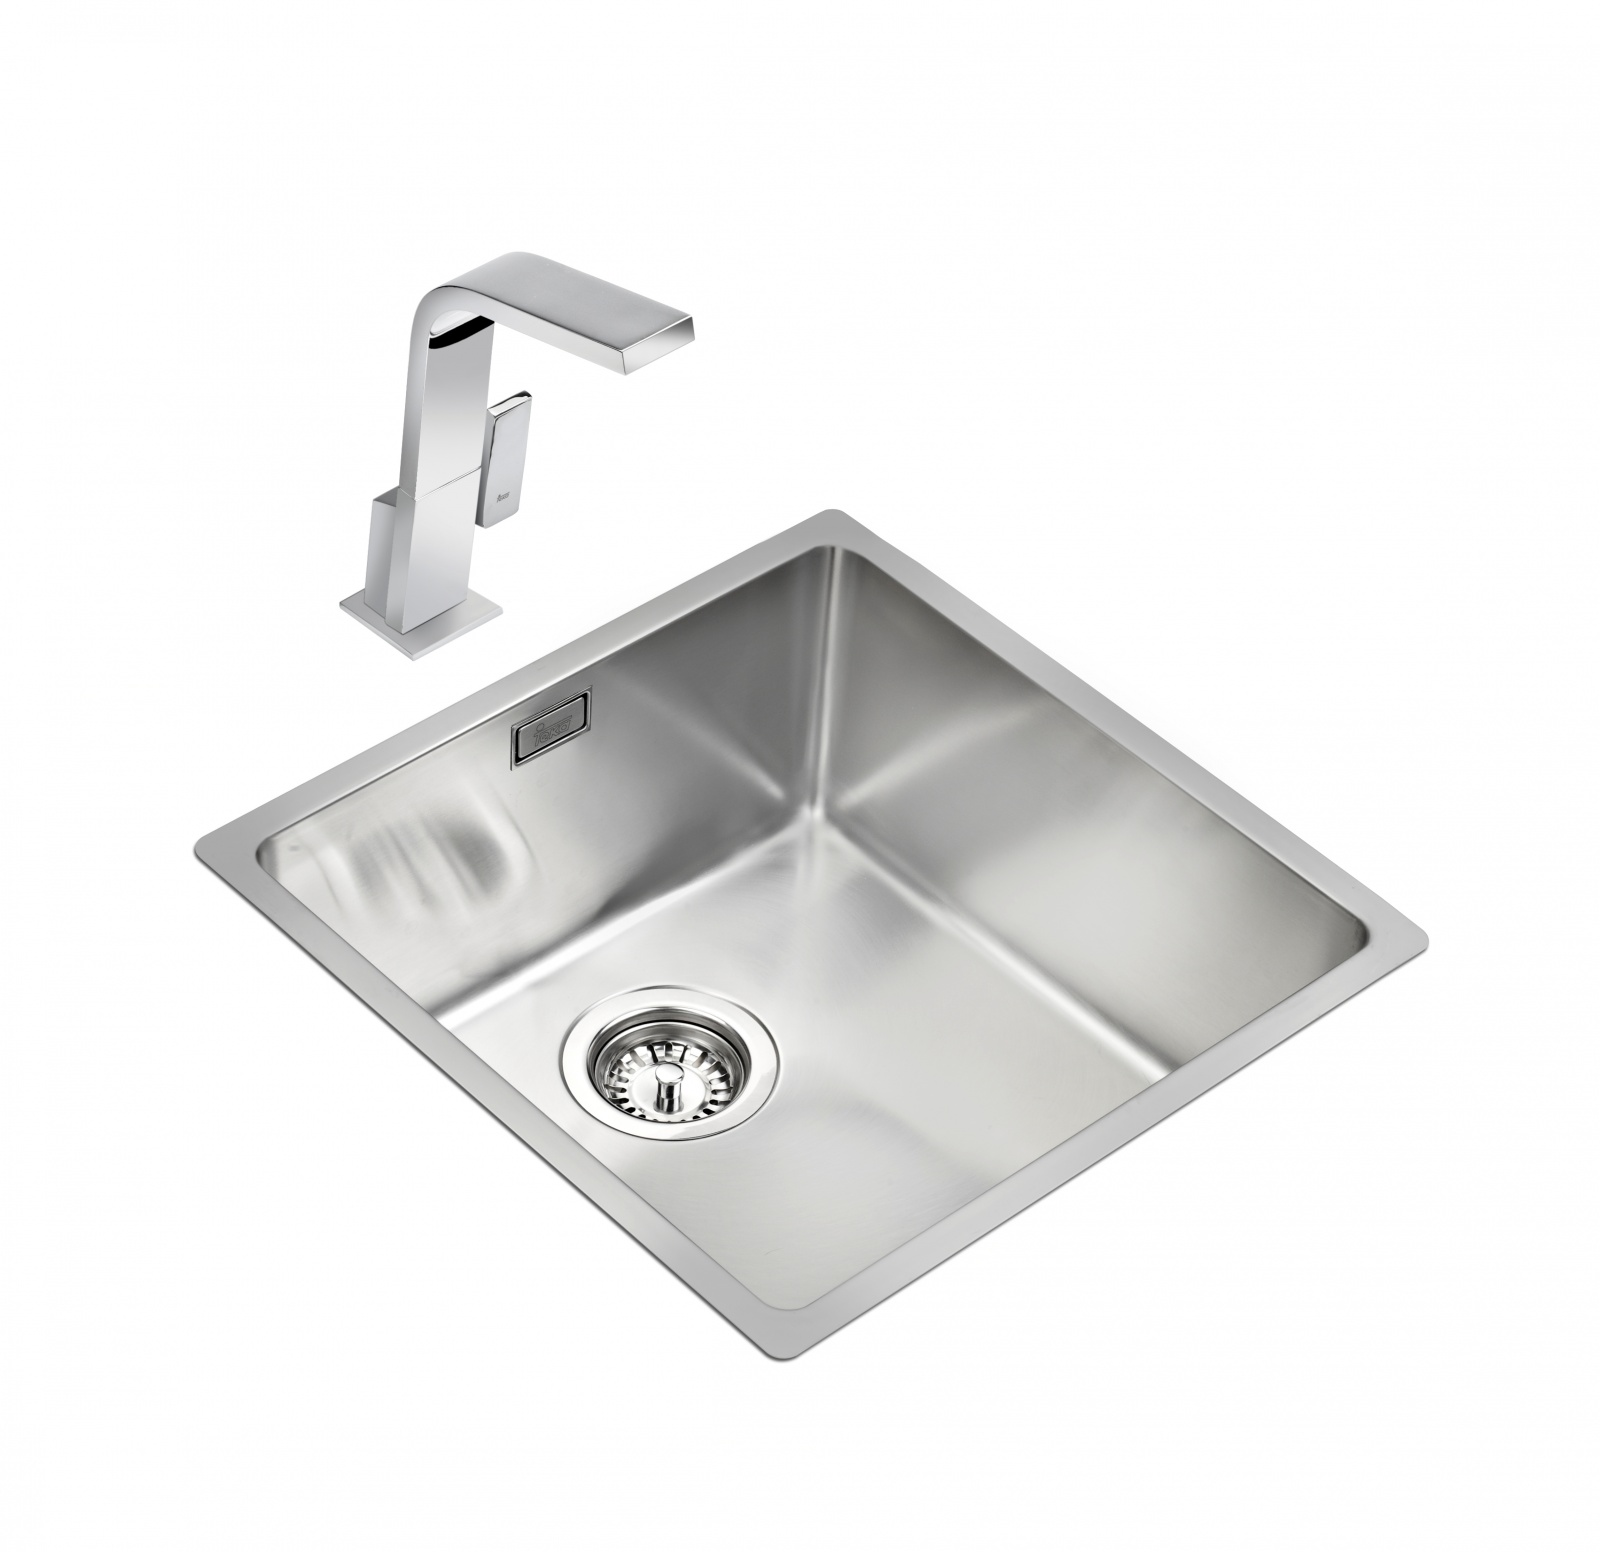 ... 400/400 Sinks Stainless steel polished Kitchen Sink sink sink eBay